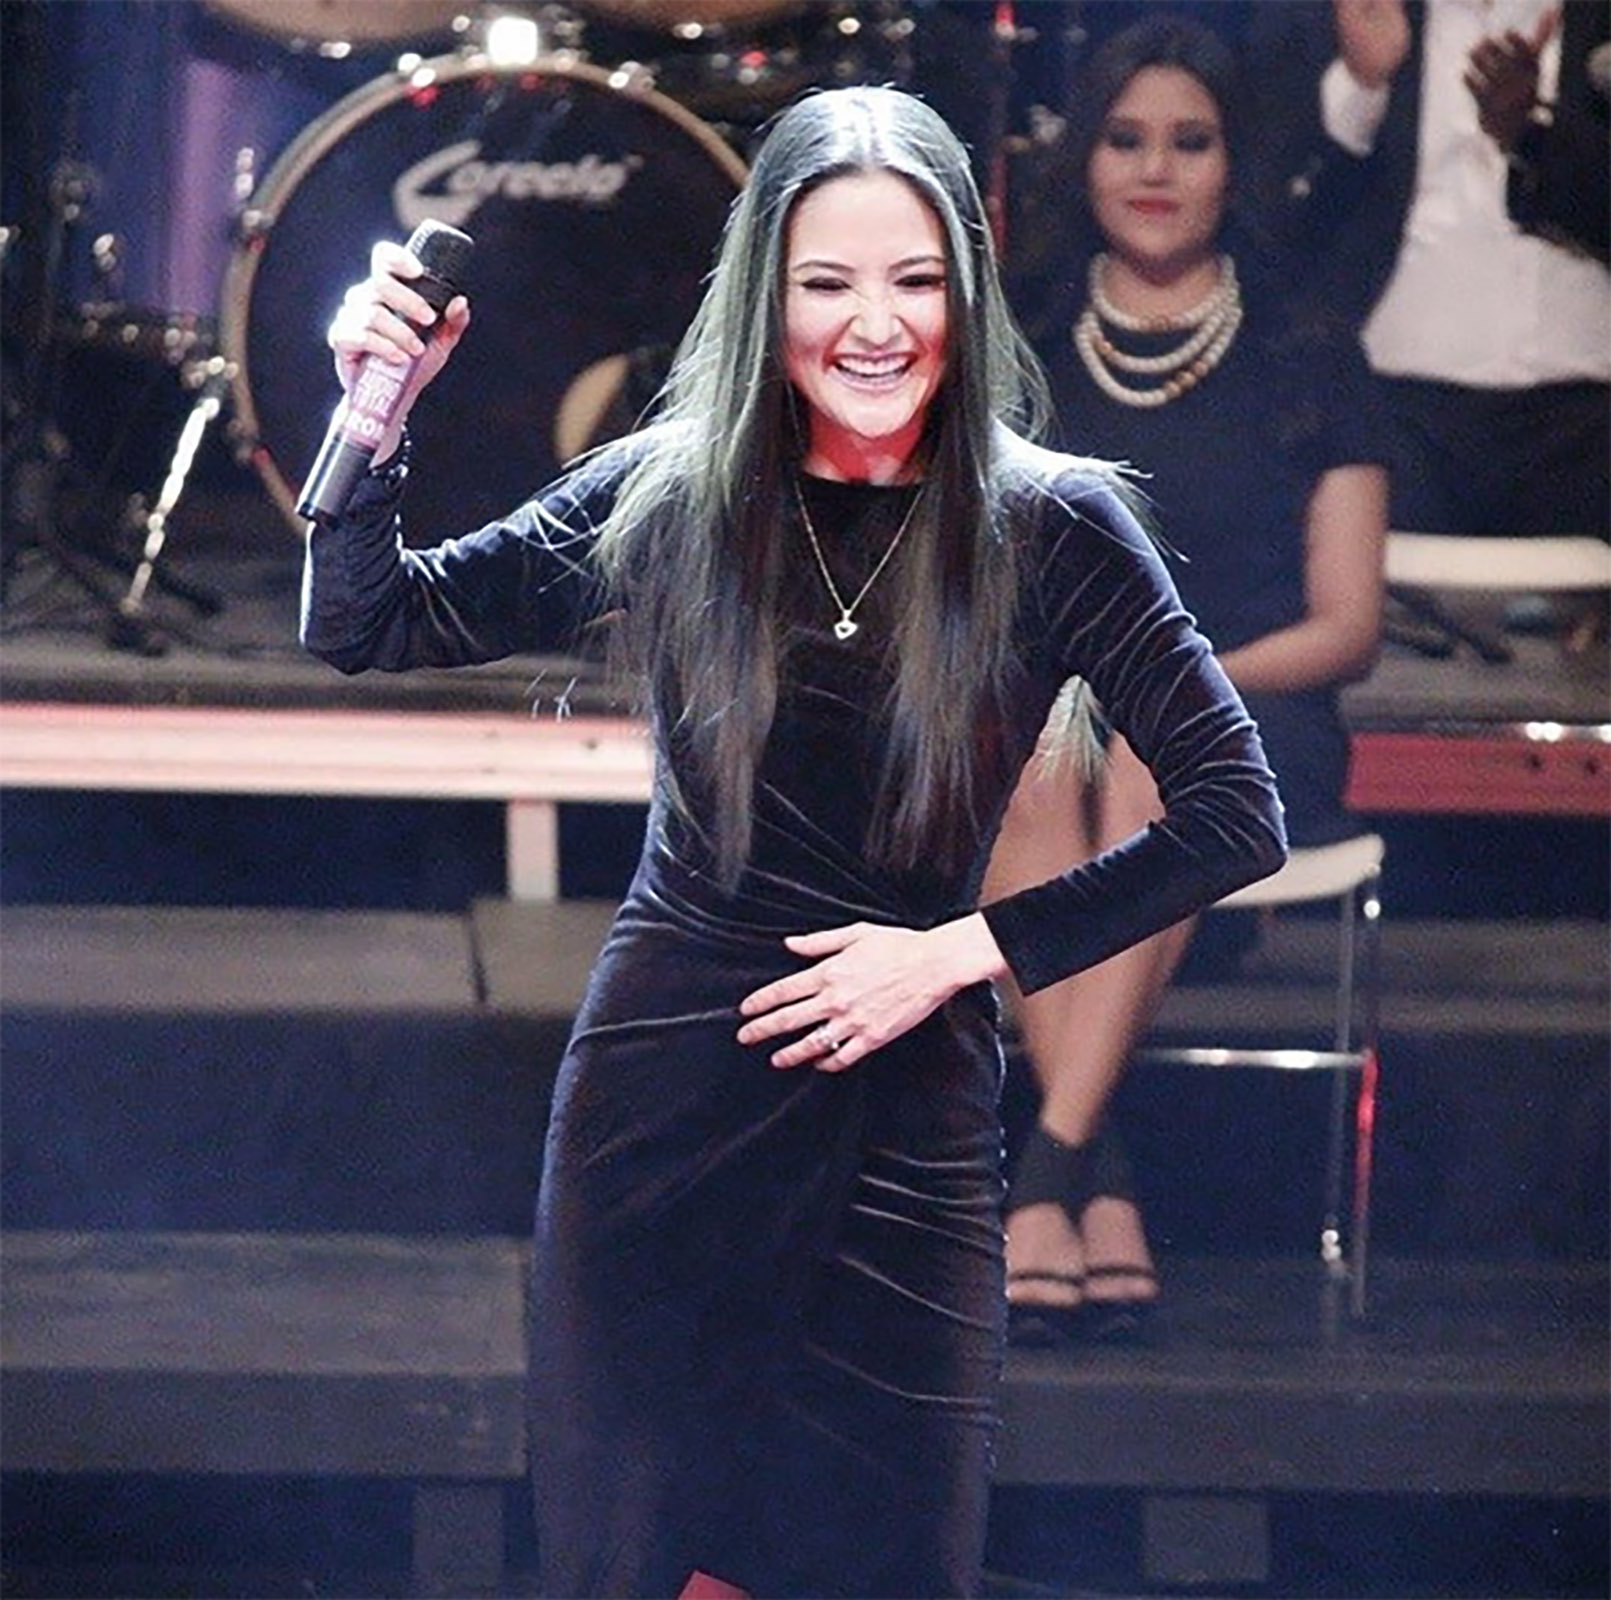 Marla Hiromi